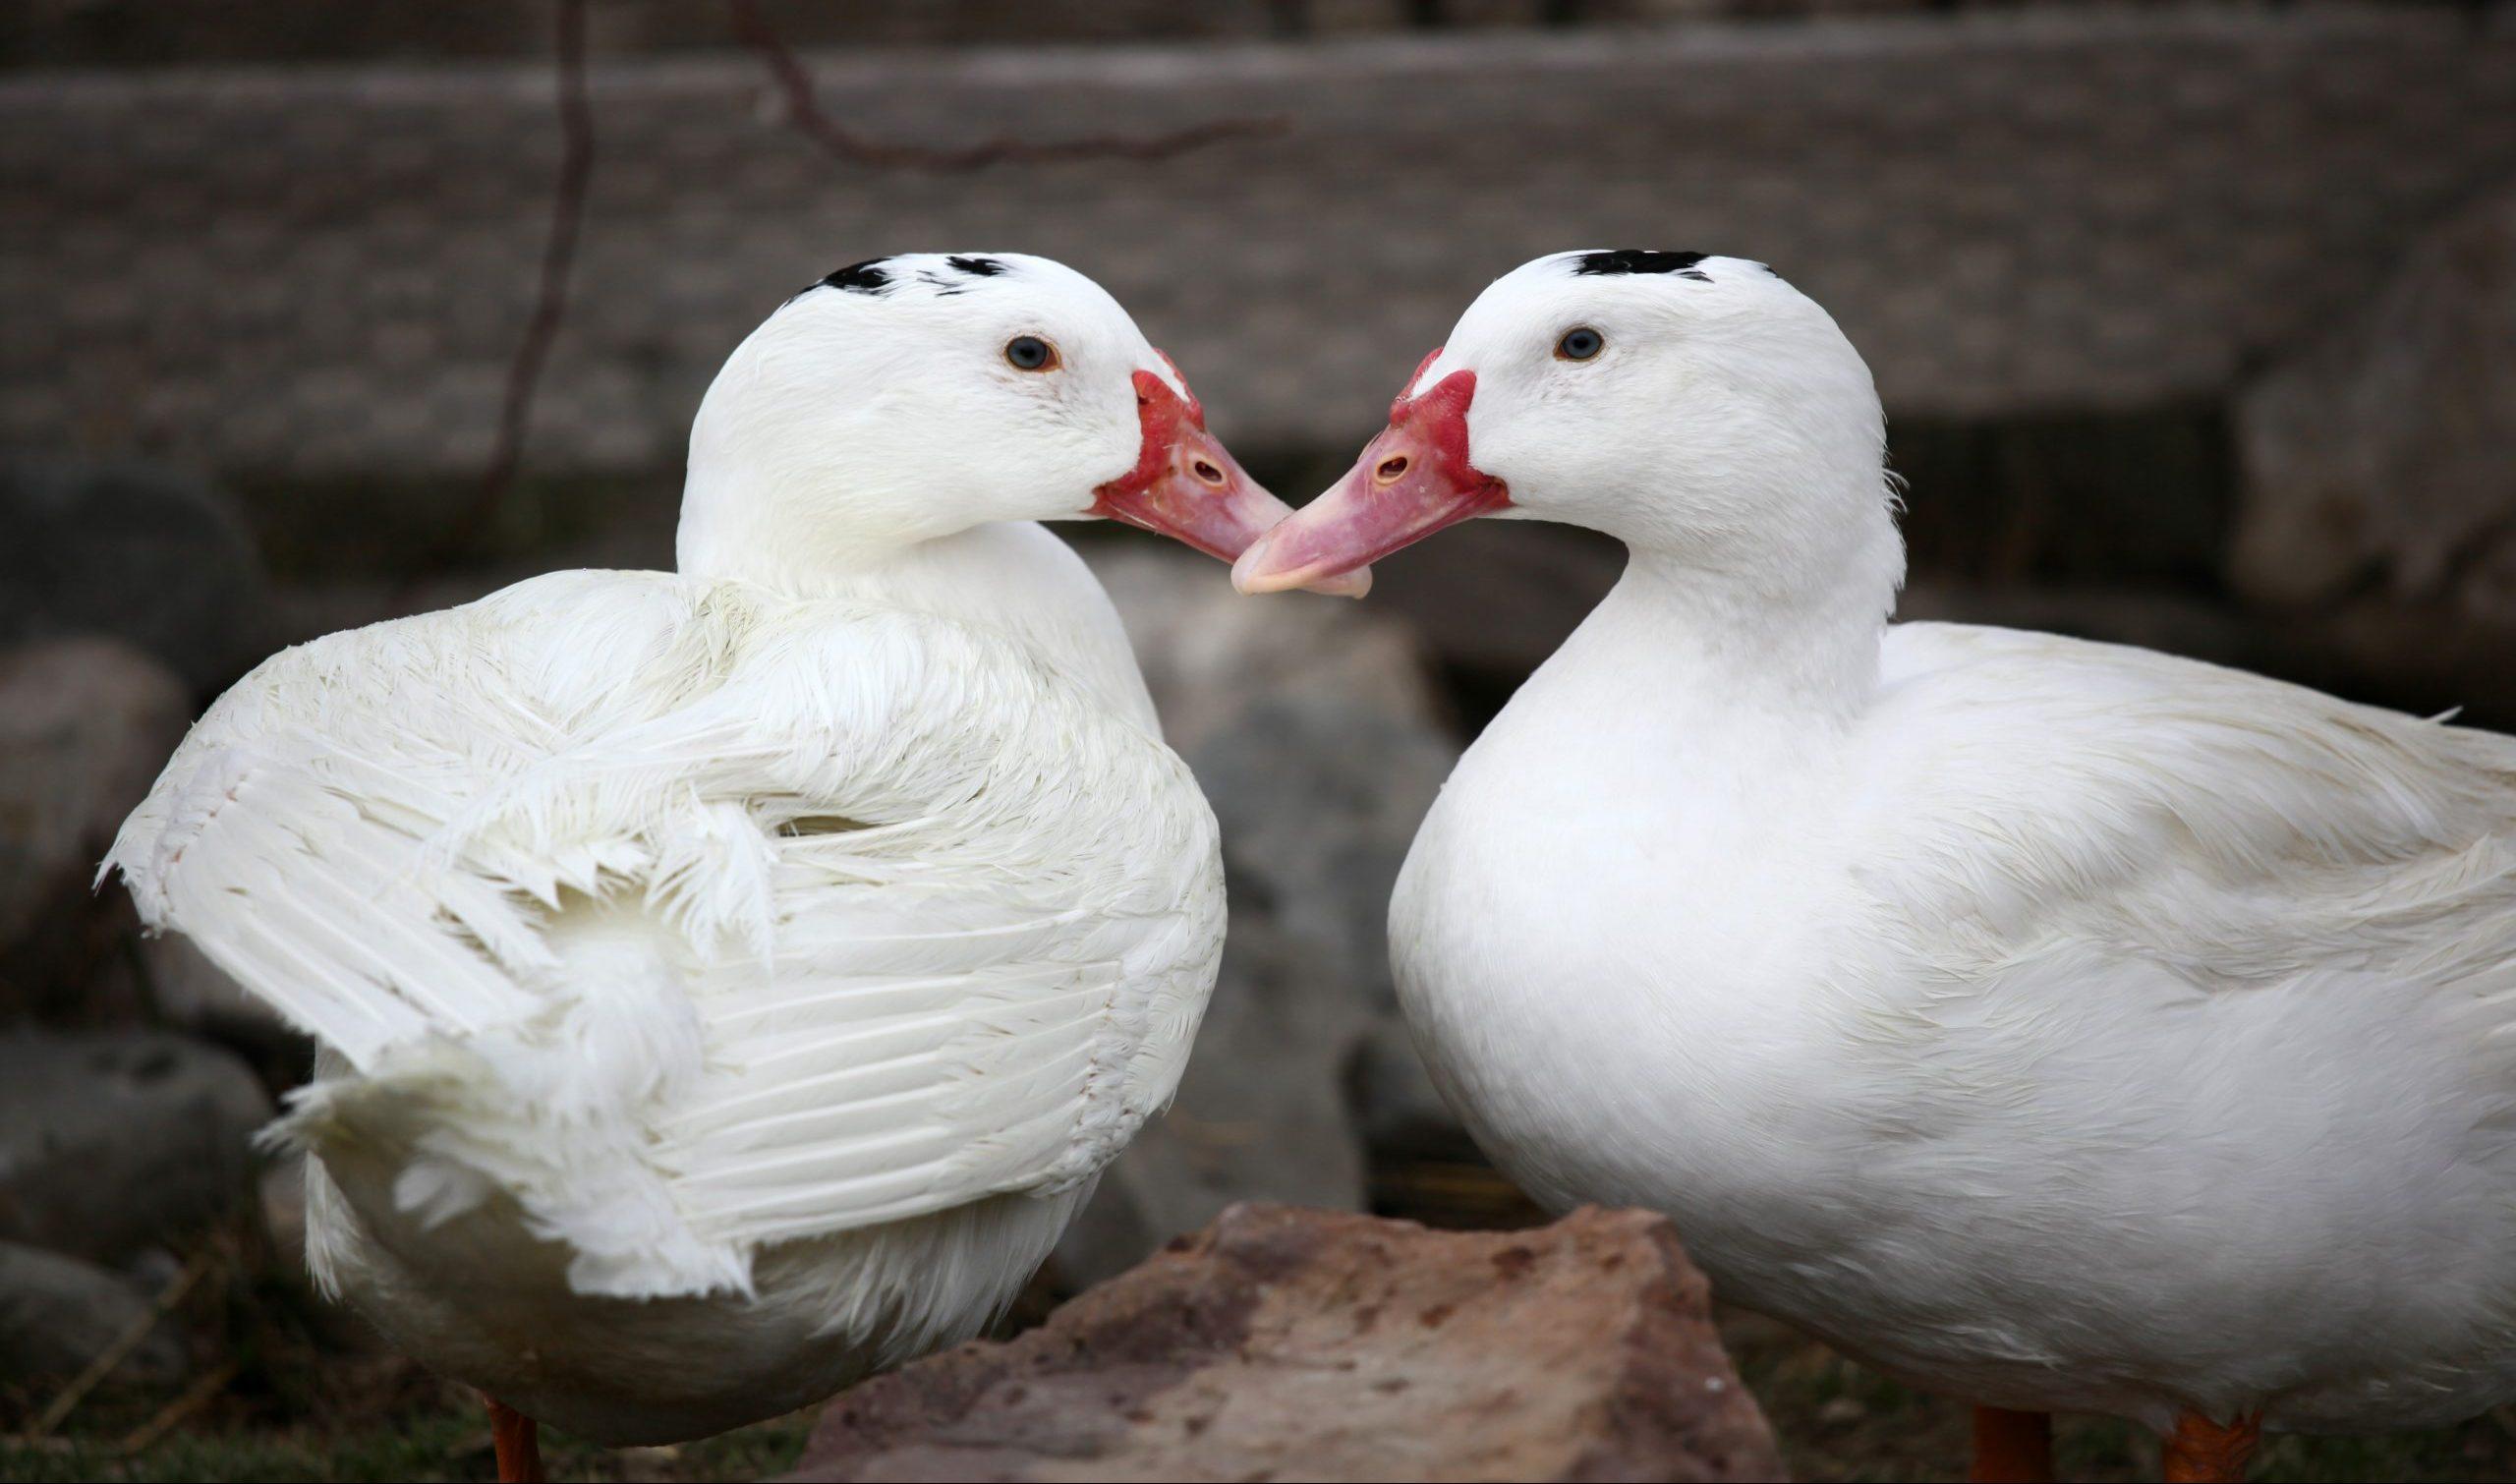 Monet and Matisse ducks